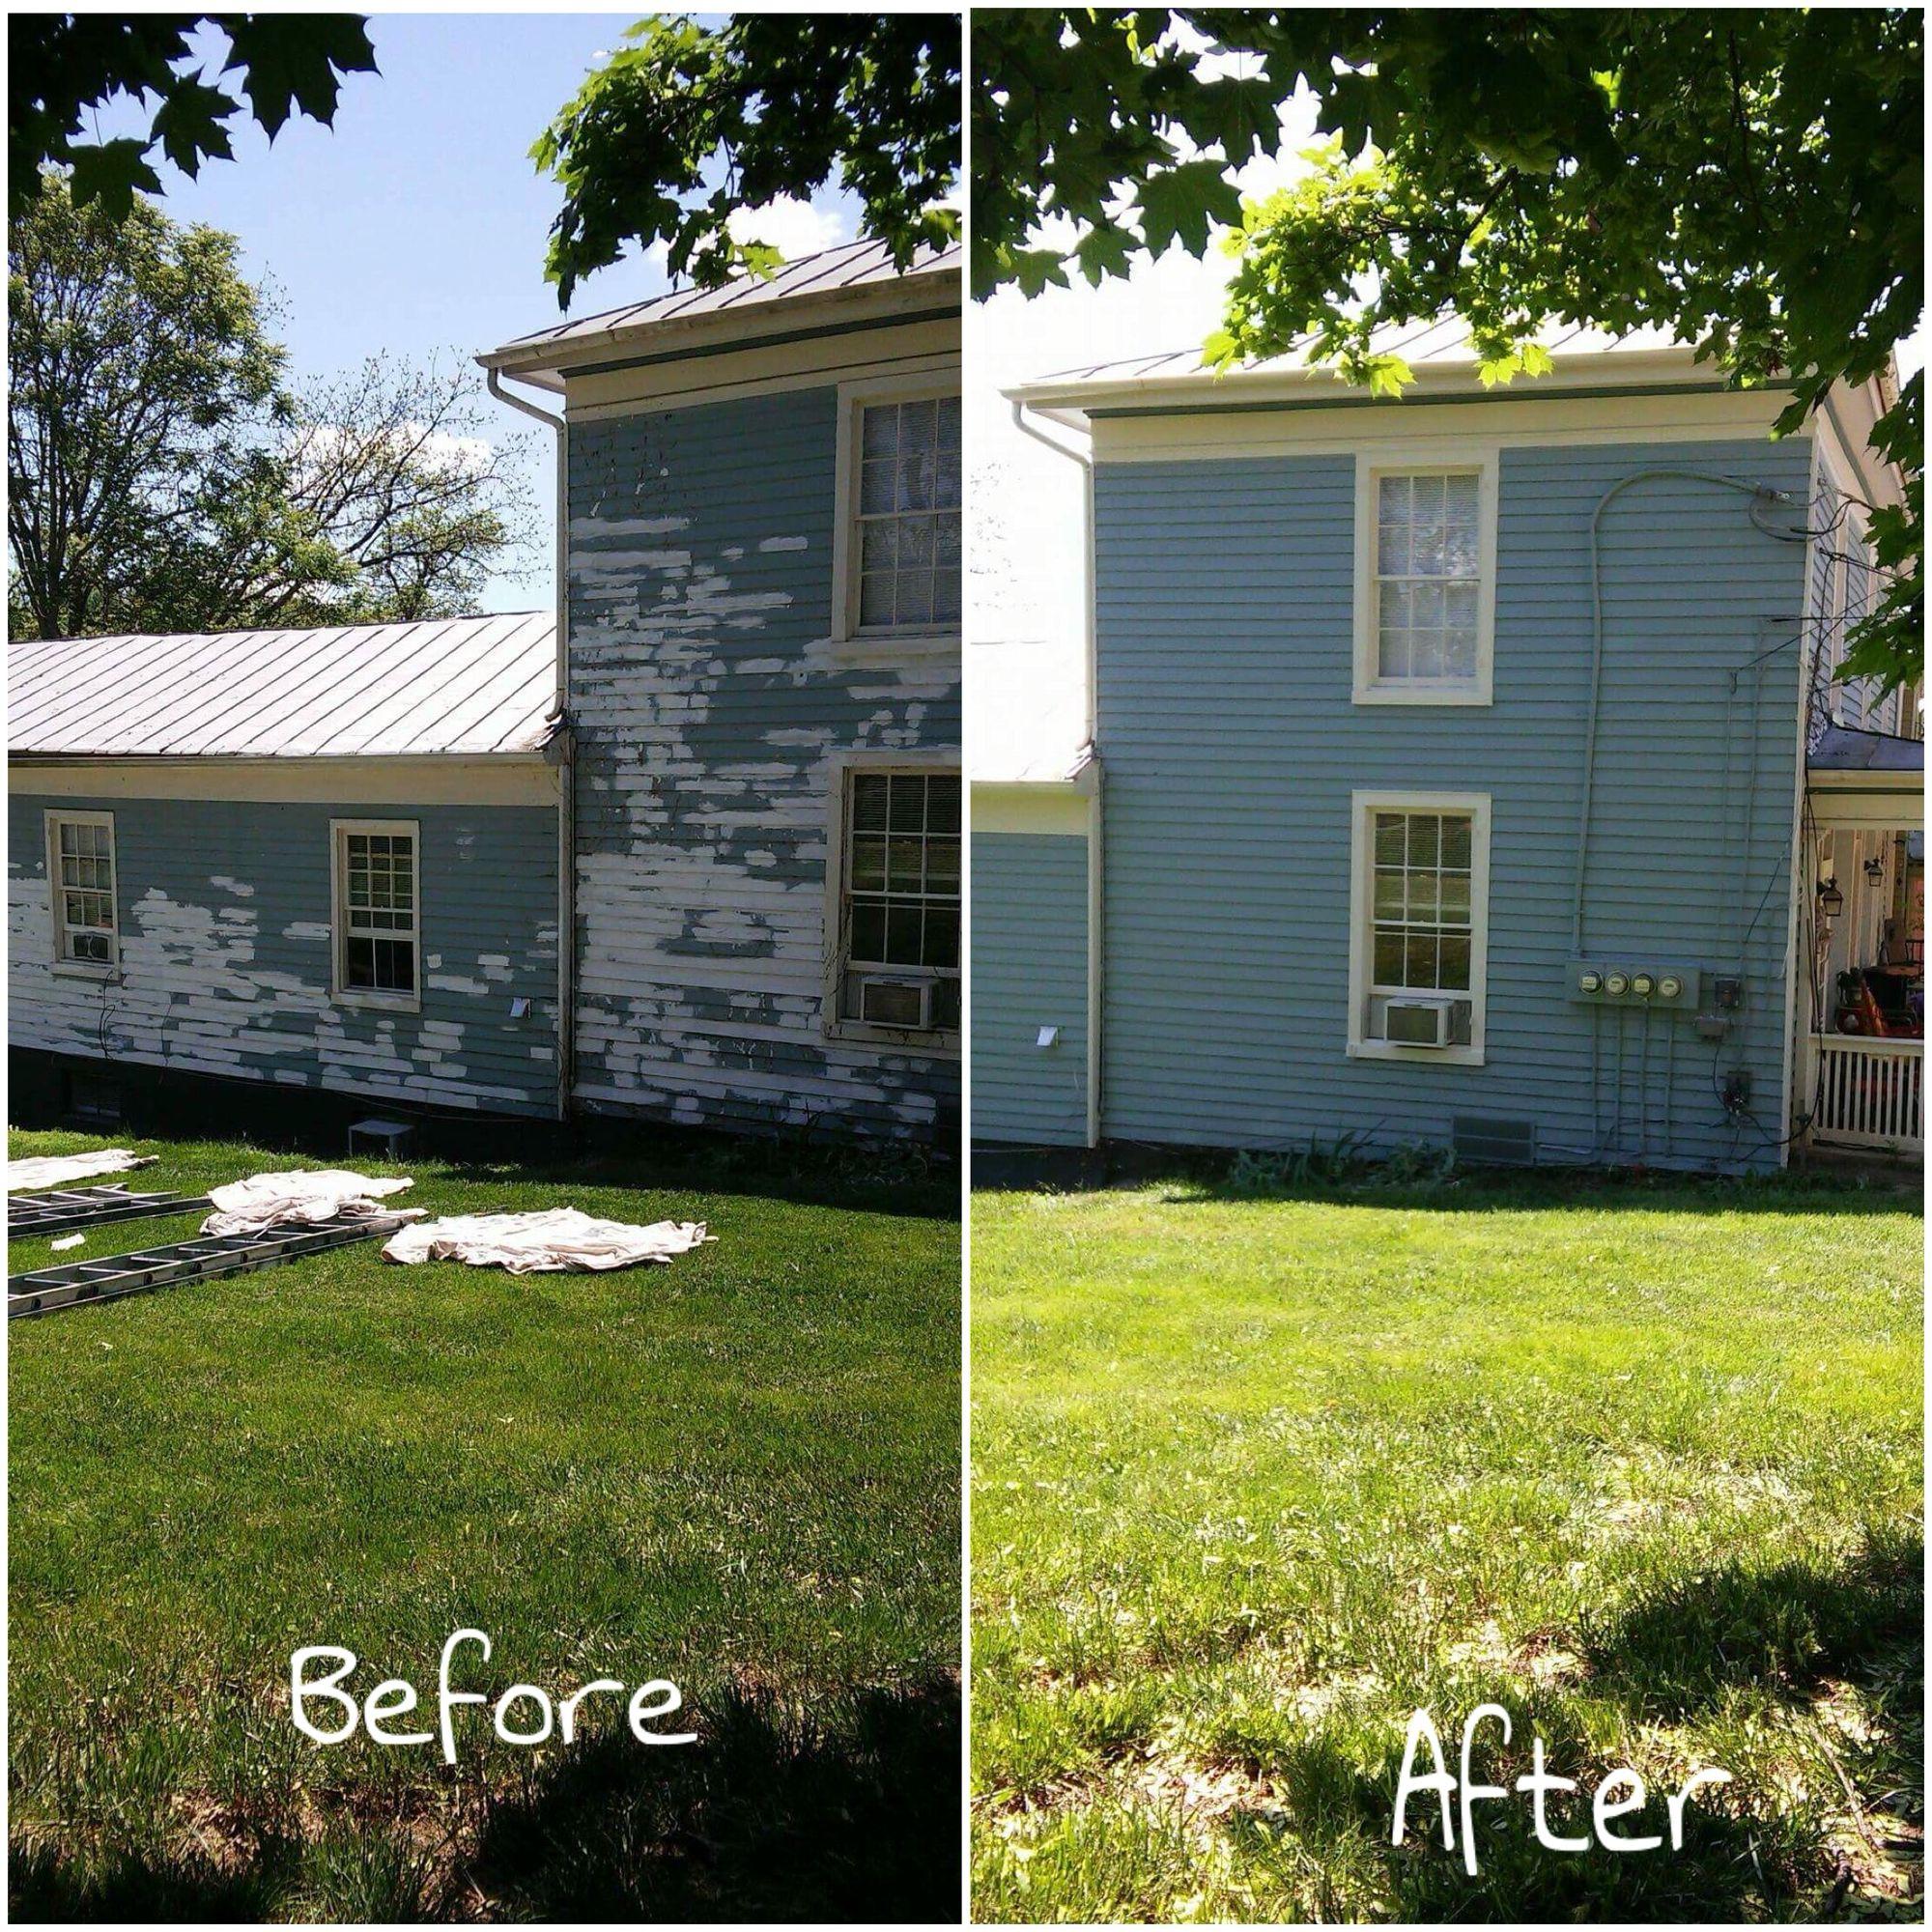 DeVore Painting   Before & After 540.280.1130   Verona, VA http://devorepainting.weebly.com